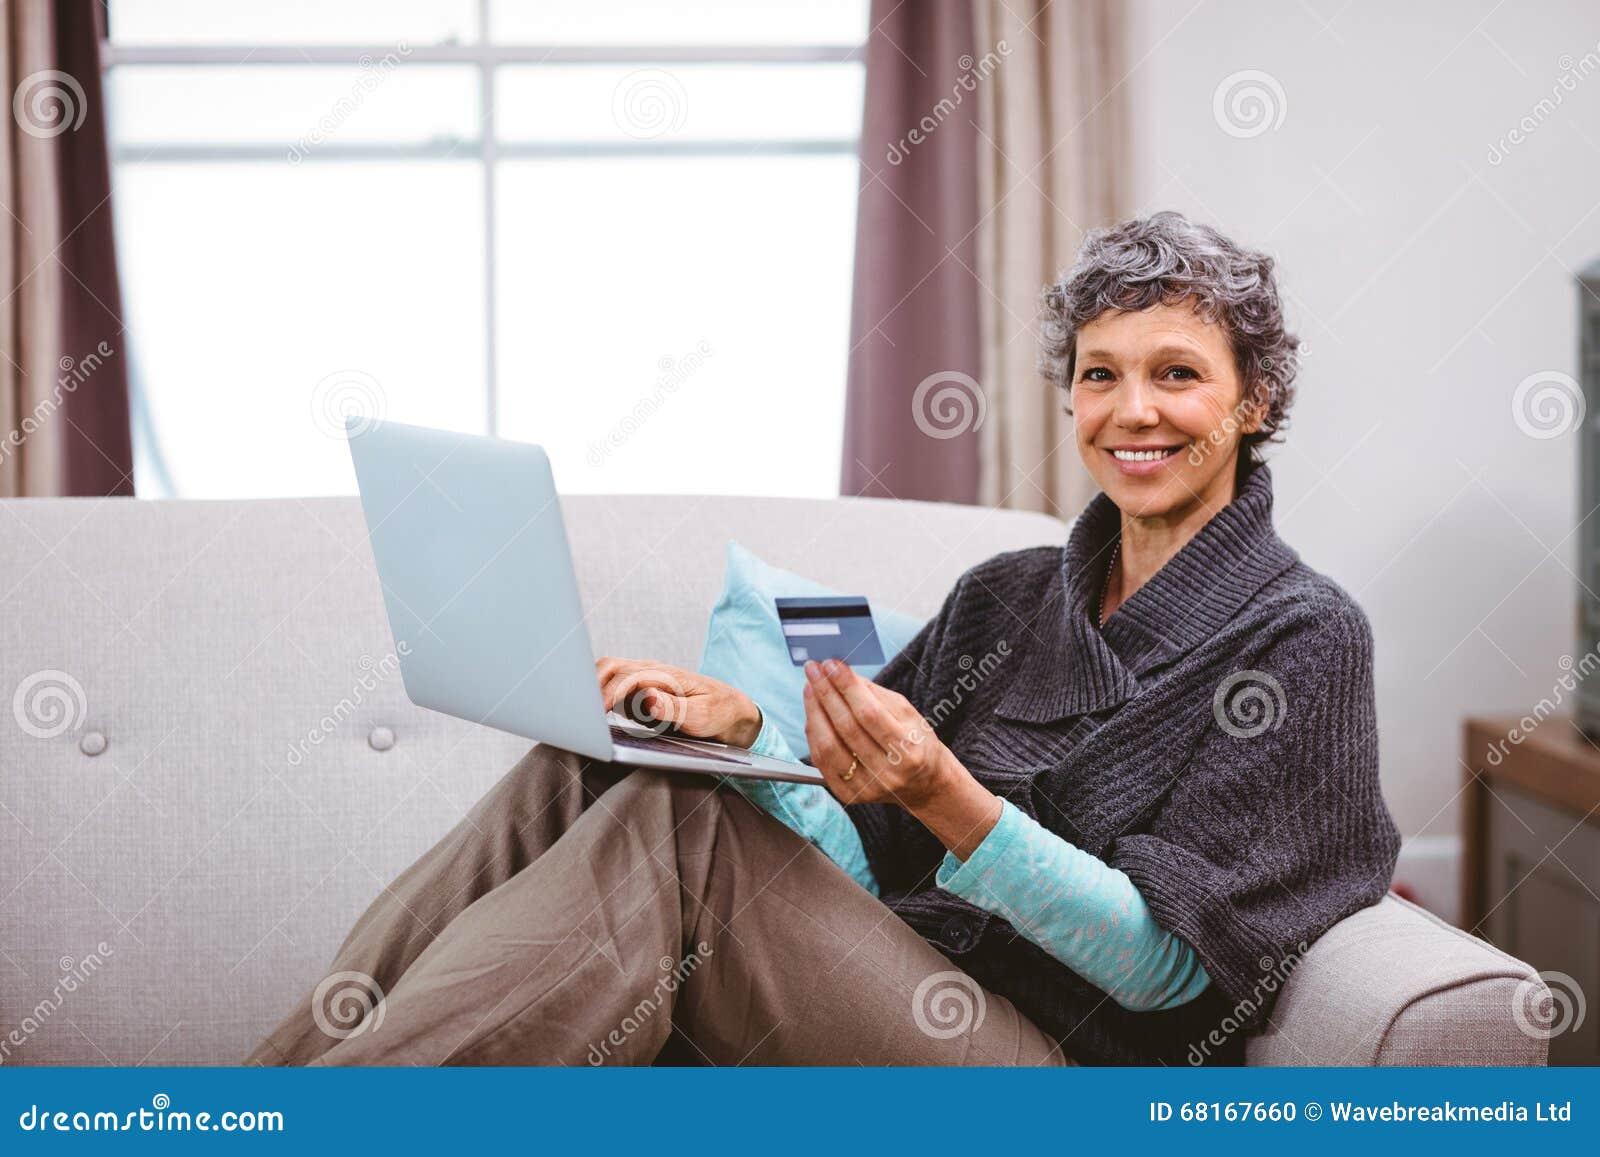 tarjeta de crédito mujer madura mamada